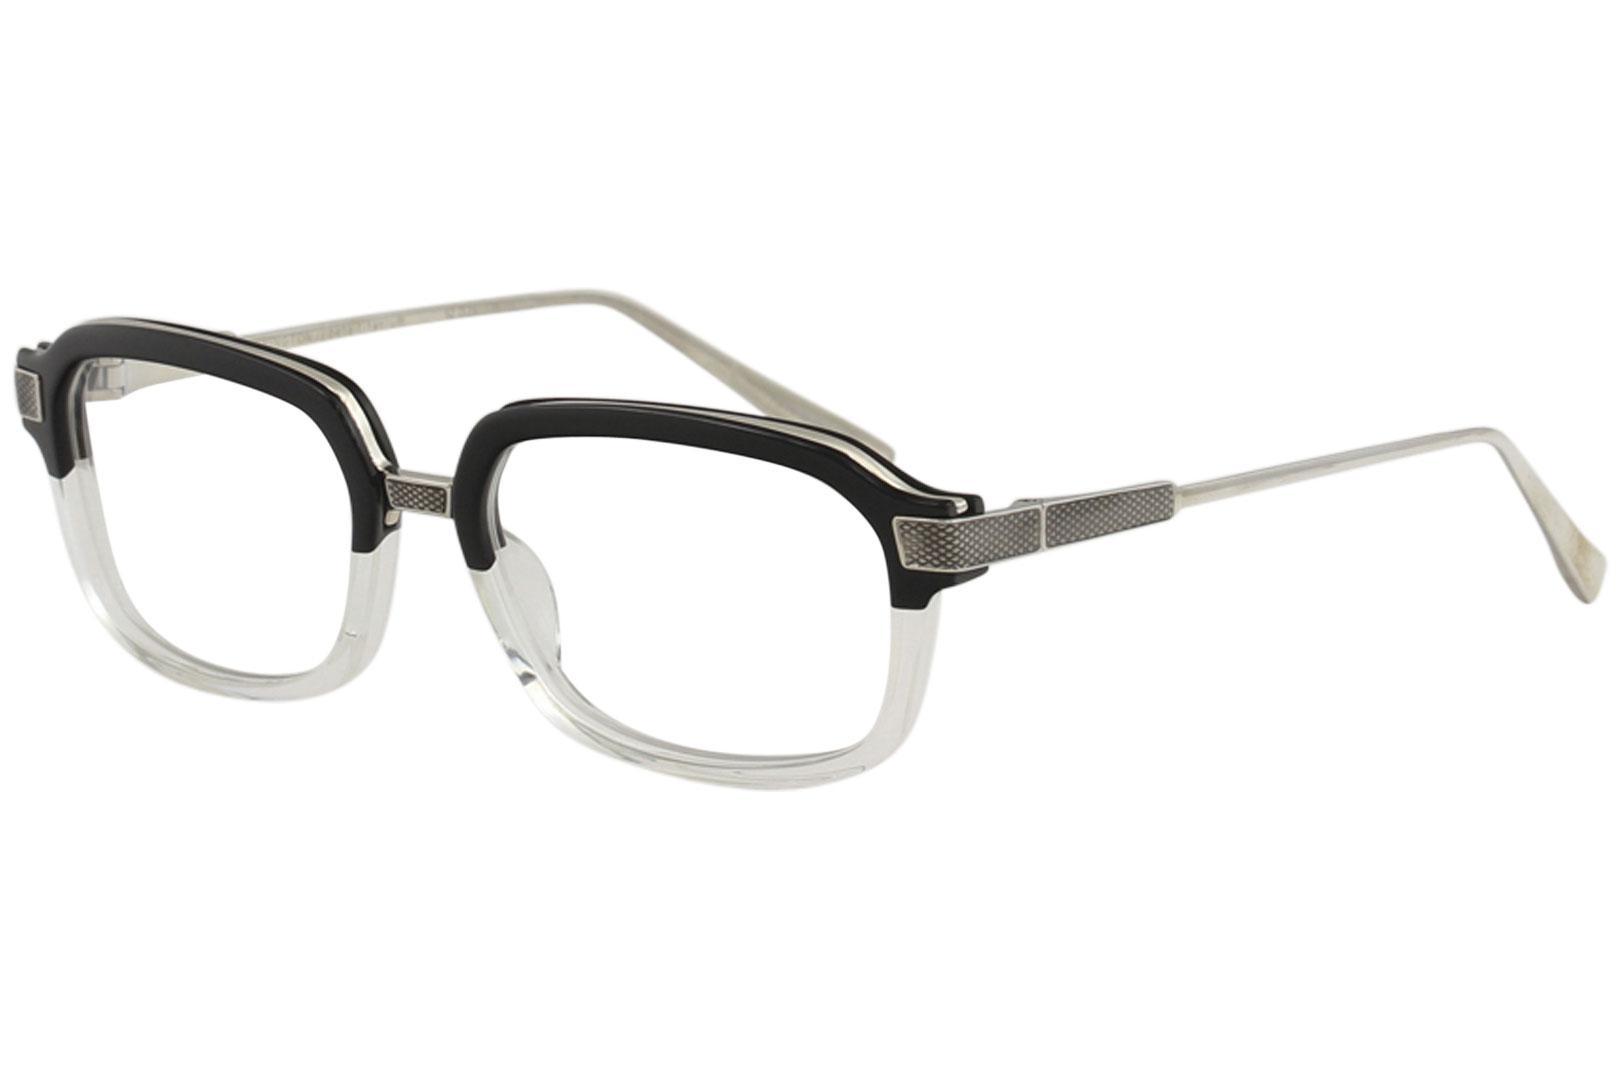 1062bc021f83 Dita Men s Eyeglasses Lexington DRX-2033 Full Rim Titanium Optical Frame